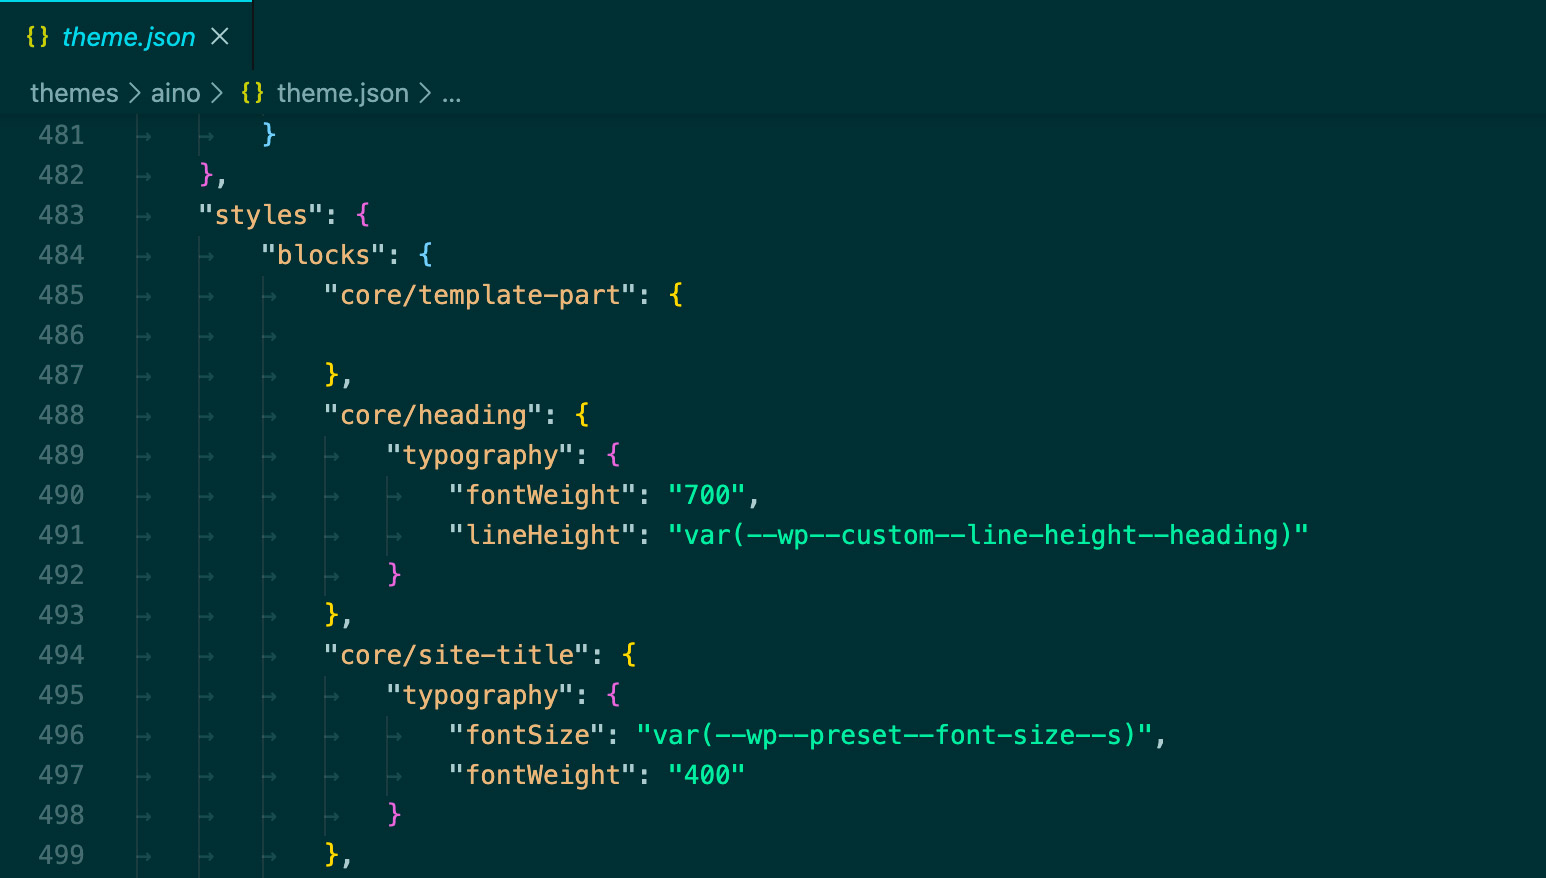 Per block settings in the theme json file.